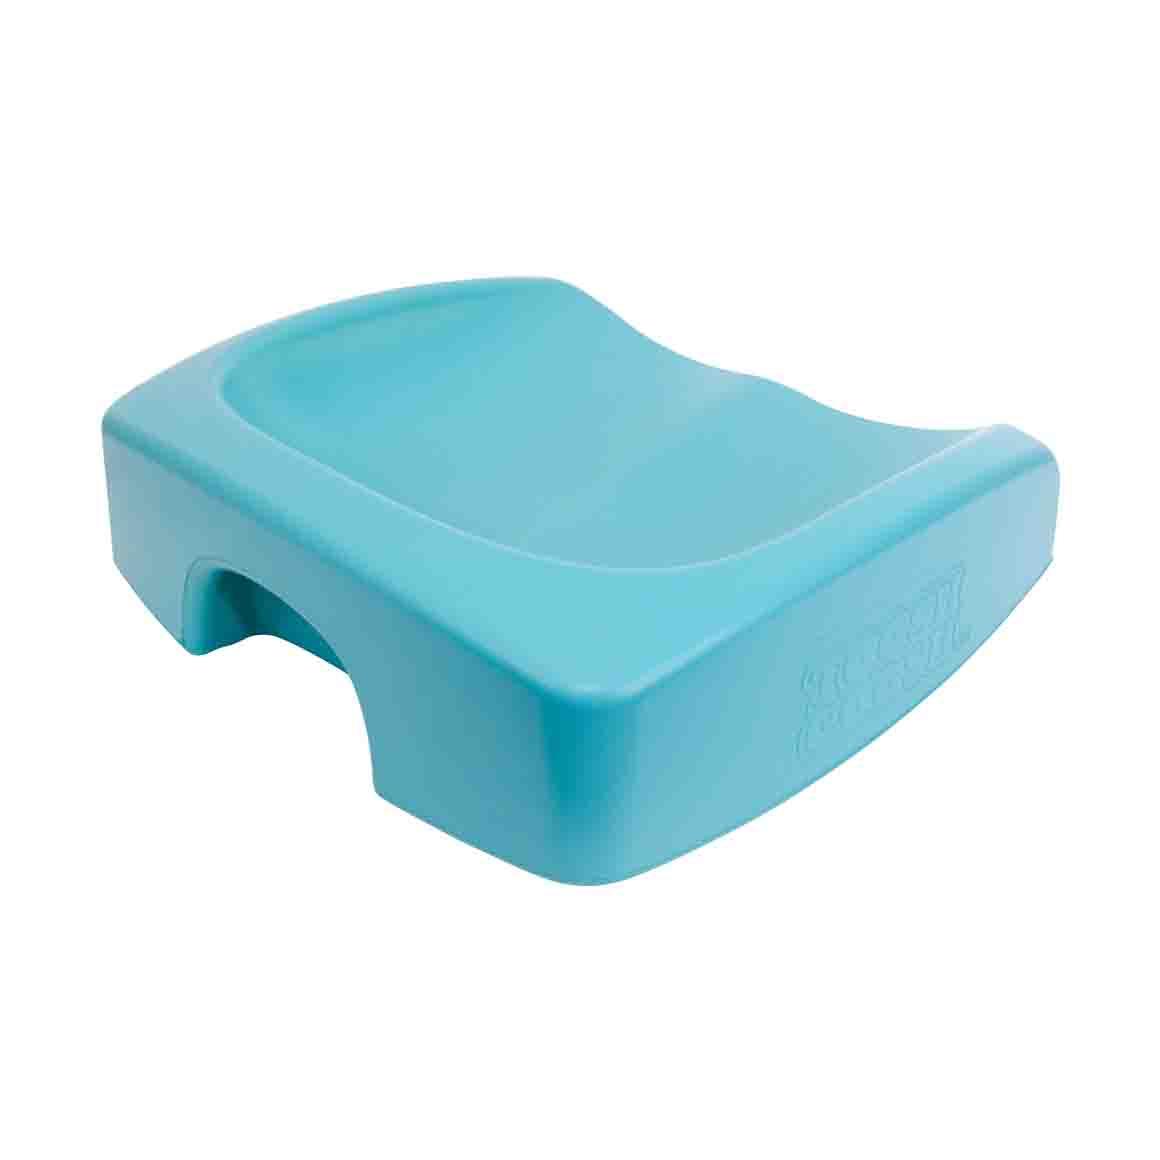 TooshCoosh Booster Seat - TEAL | Trada Marketplace